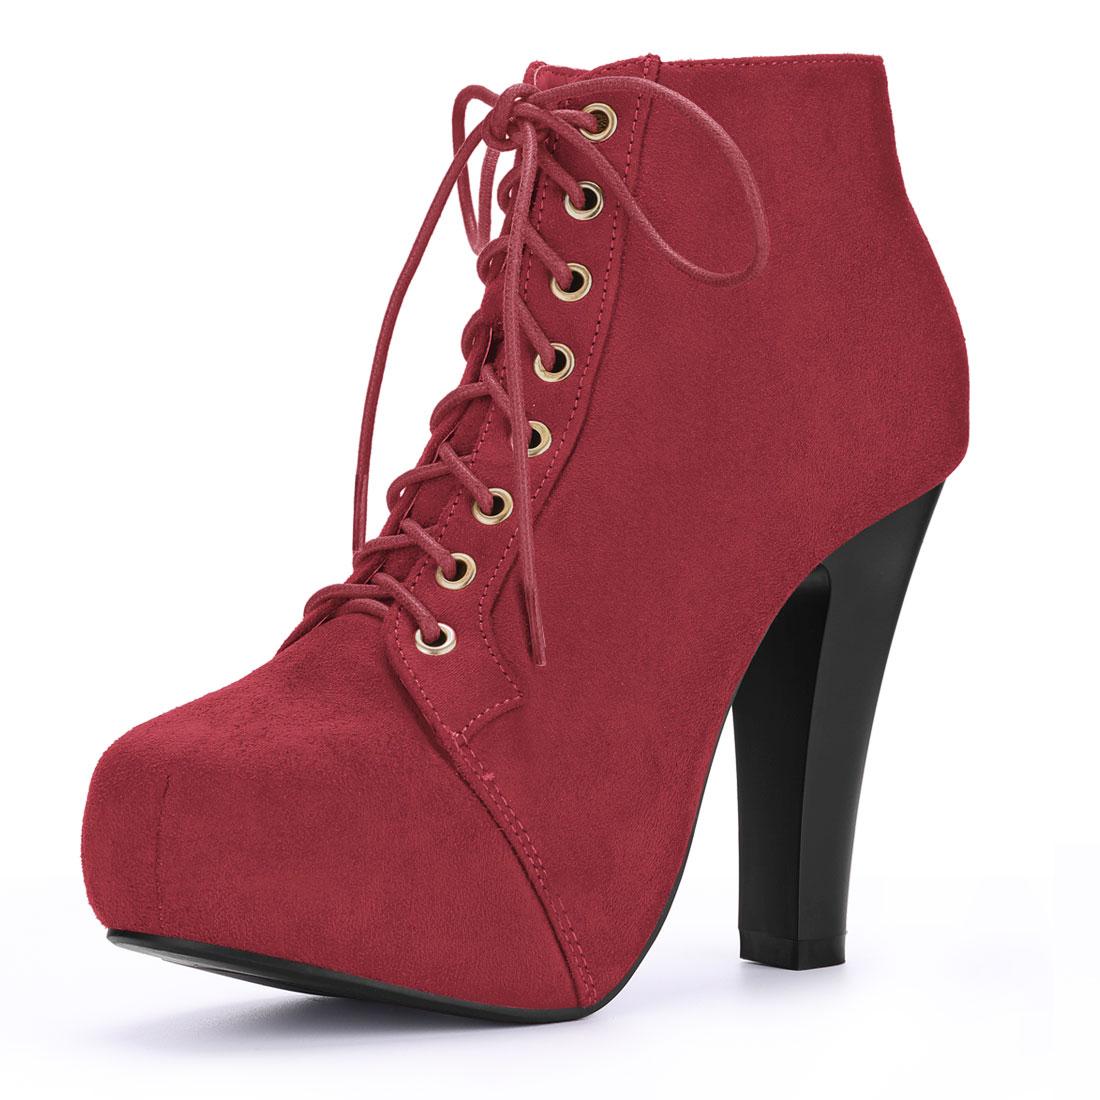 Women Round Toe High Heel Platform Lace Up Booties Red US 8